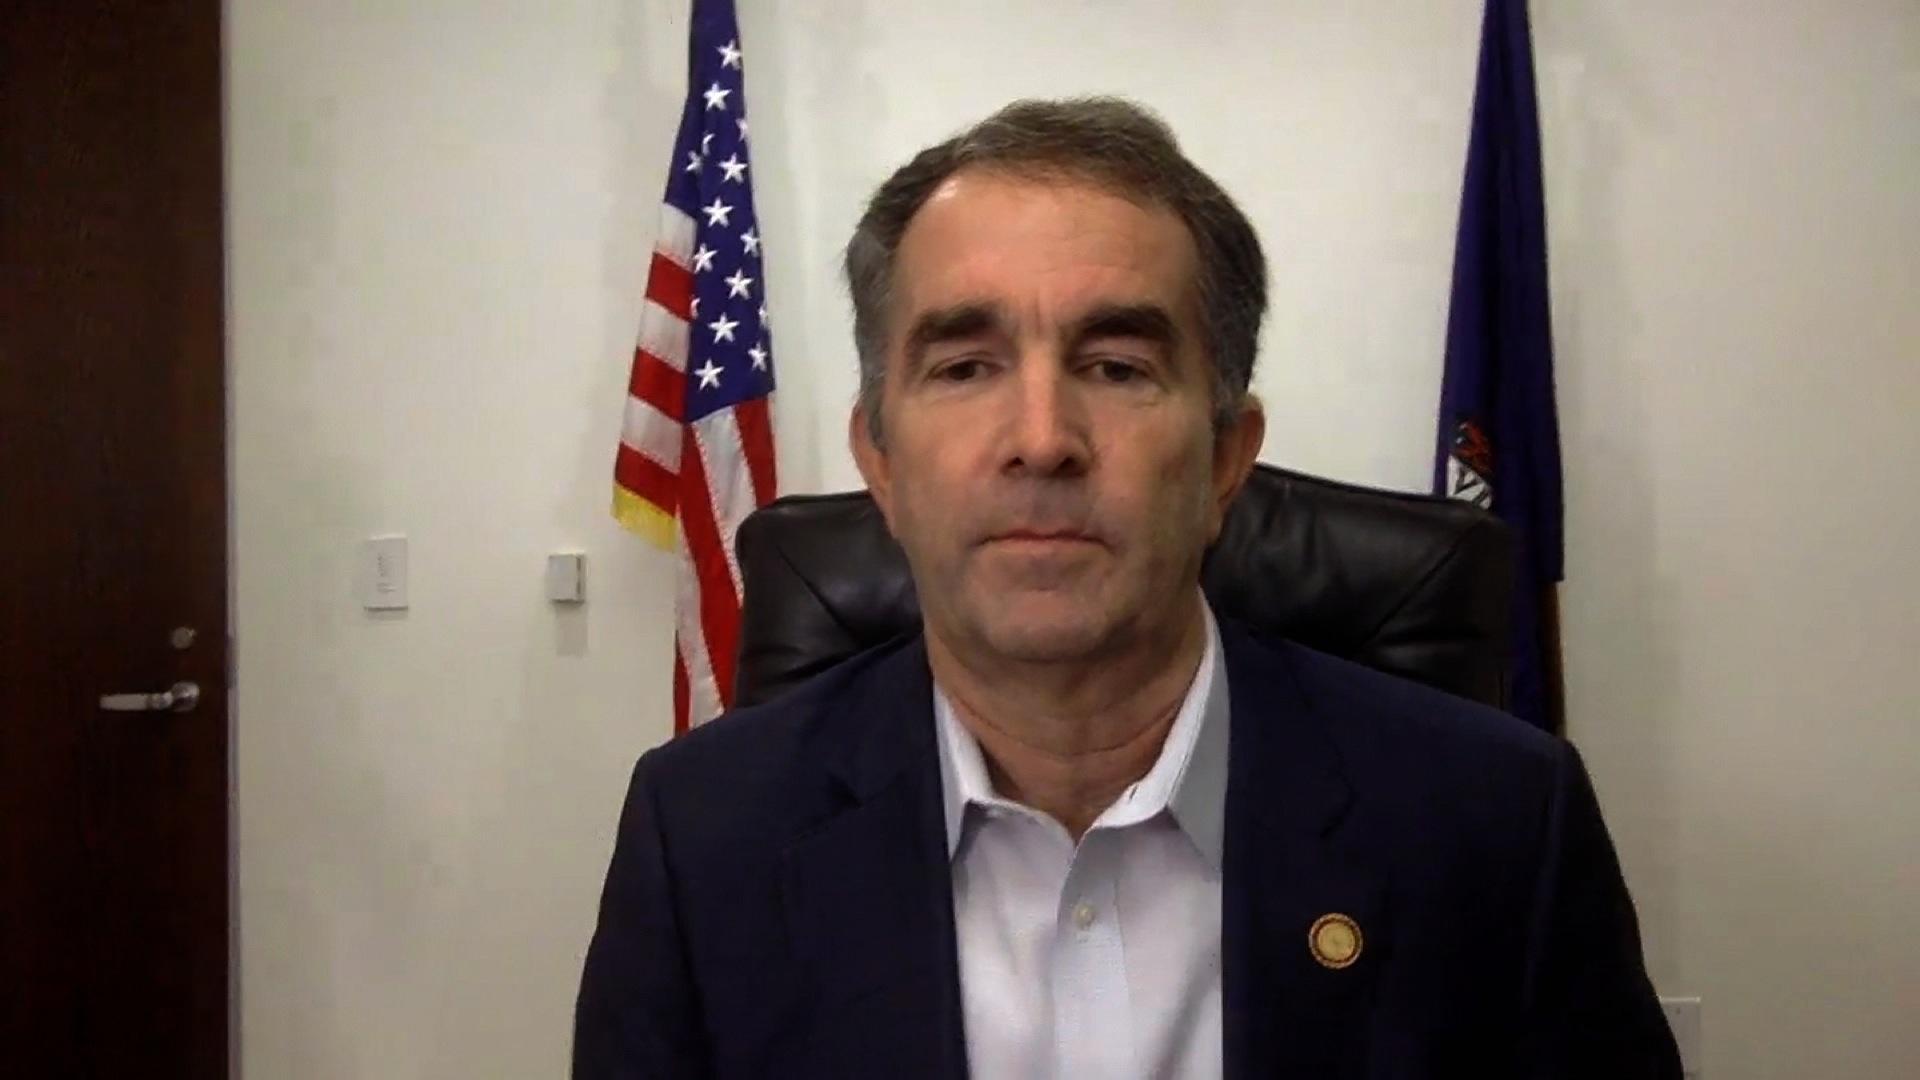 Virginia's governor signs legislation banning no-knock warrants